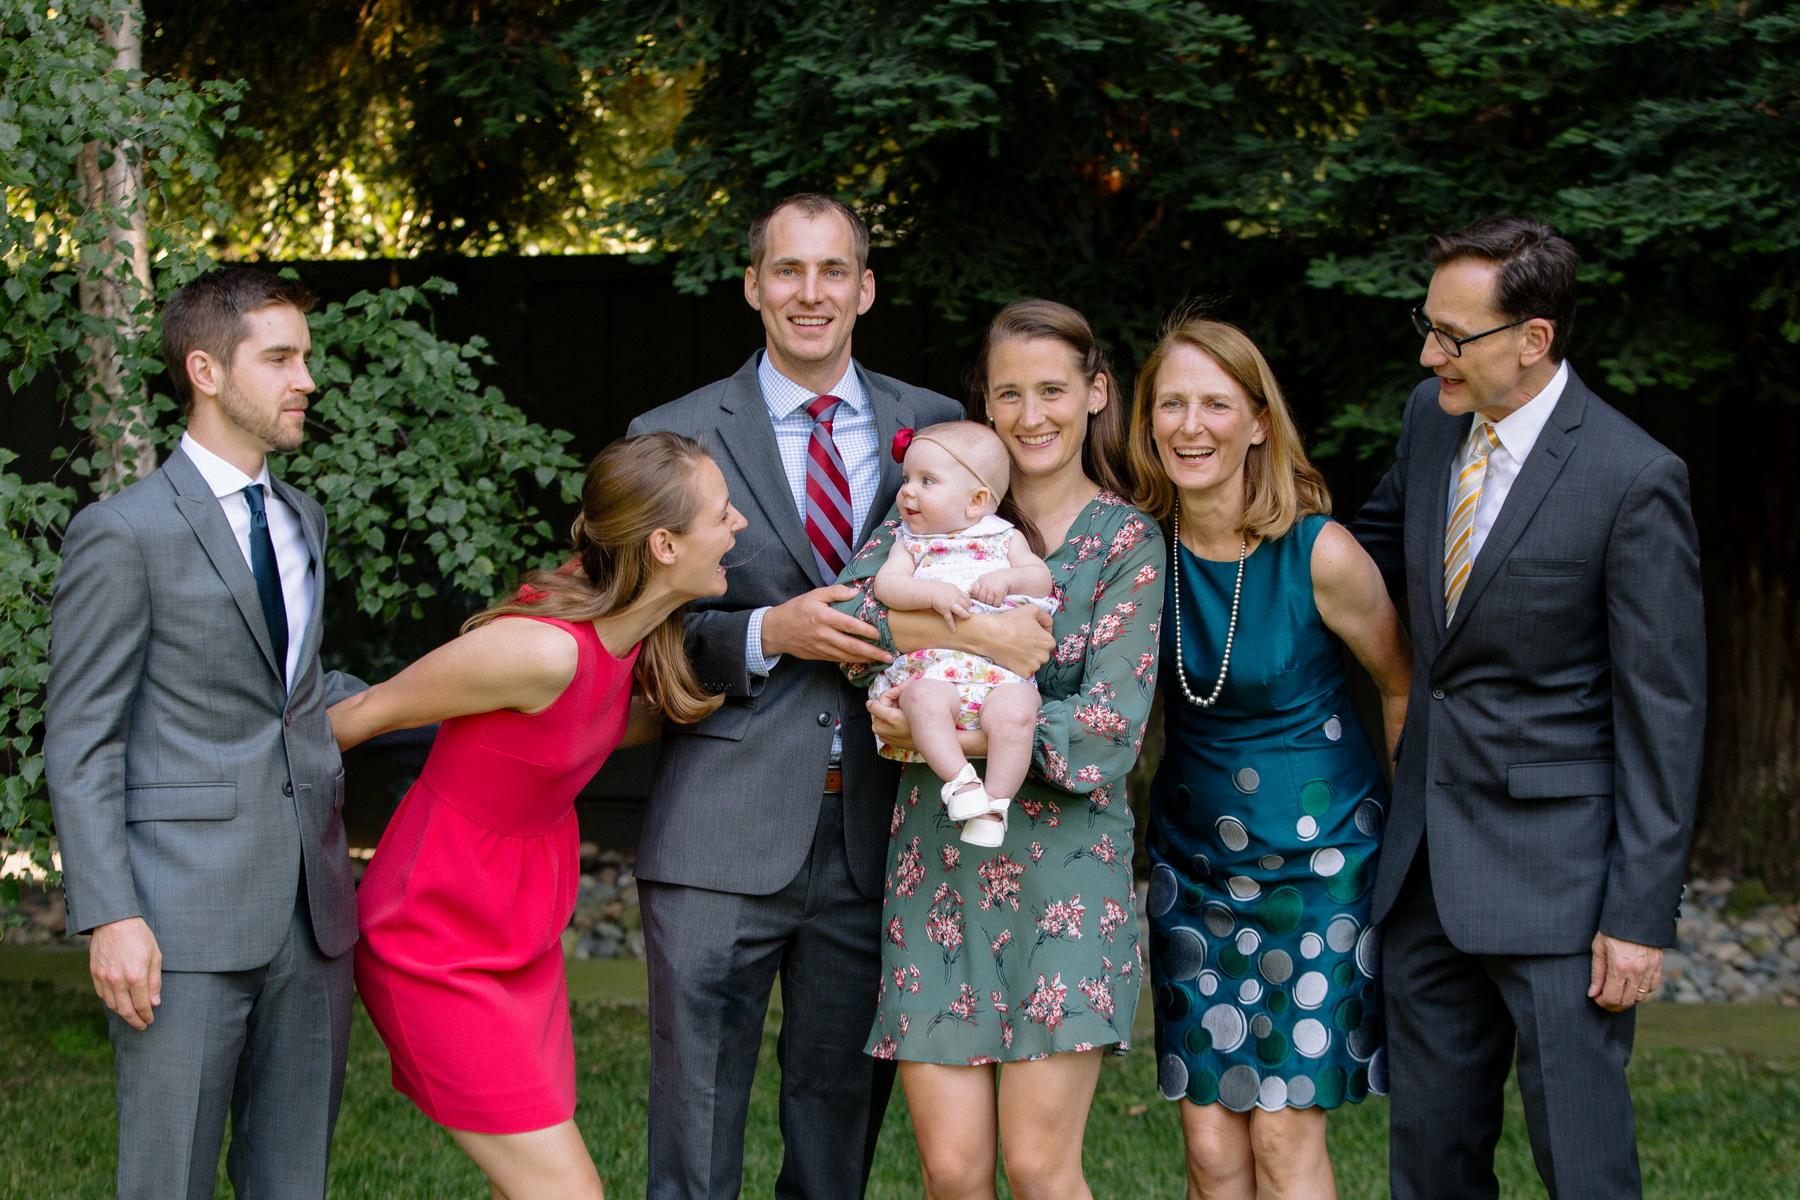 casual family portrait at a backyard wedding